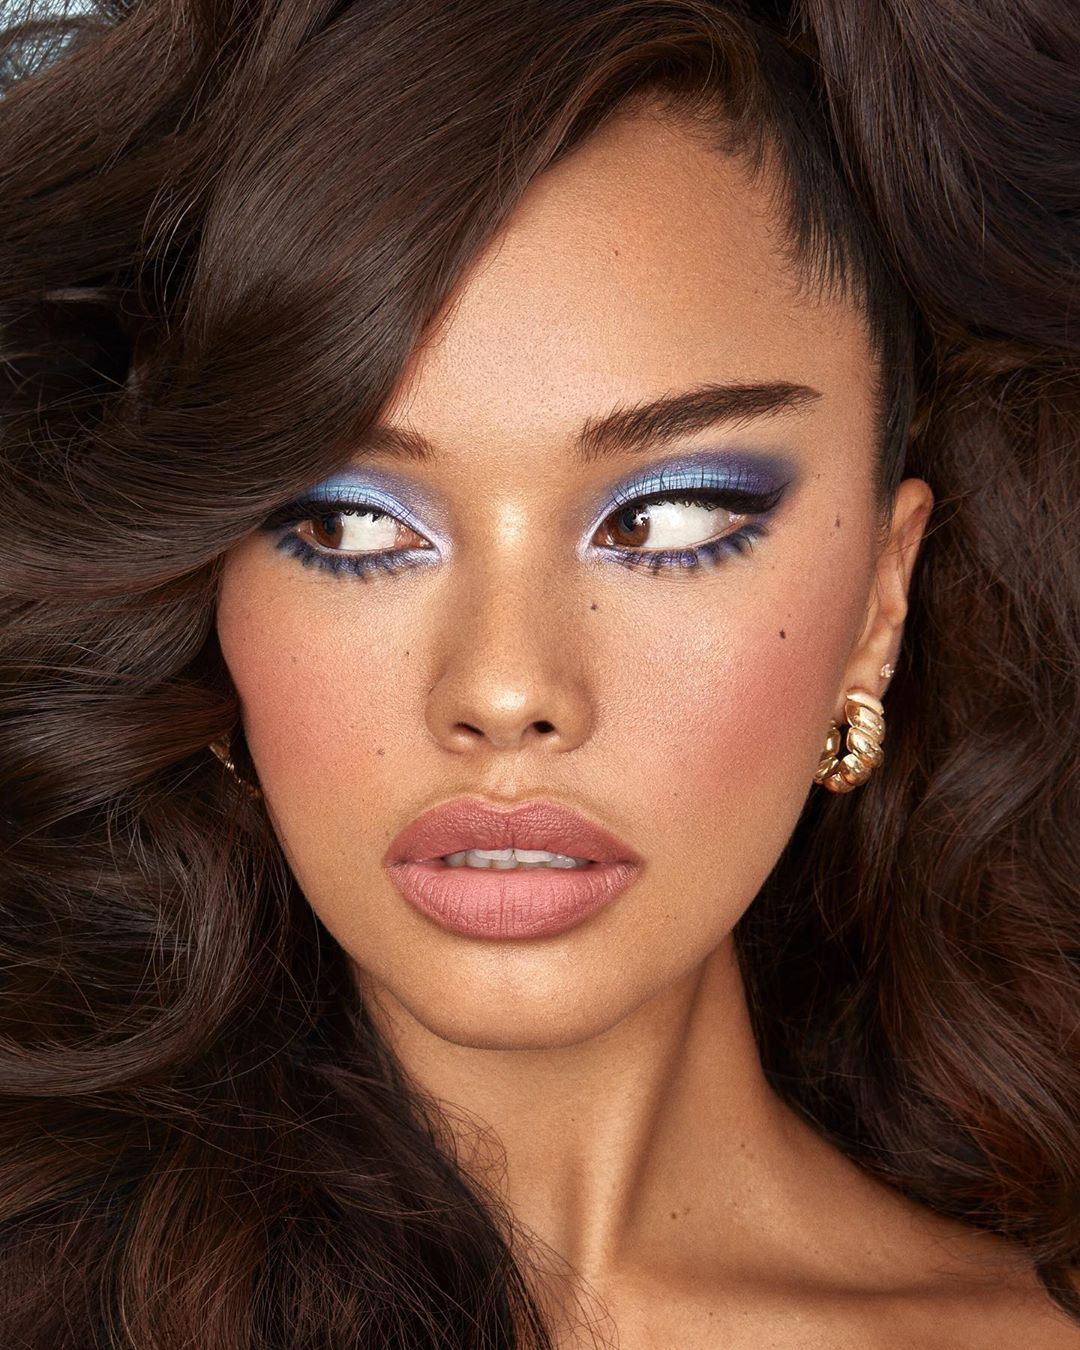 "Photo of Nikki_Makeup on Instagram: ""Tutorial for this look on beautiful @kehaulanisanares is now saved to my highlights 💕 Amazing hair @lukepluckrose  Photo @sarahbrownphoto…"""